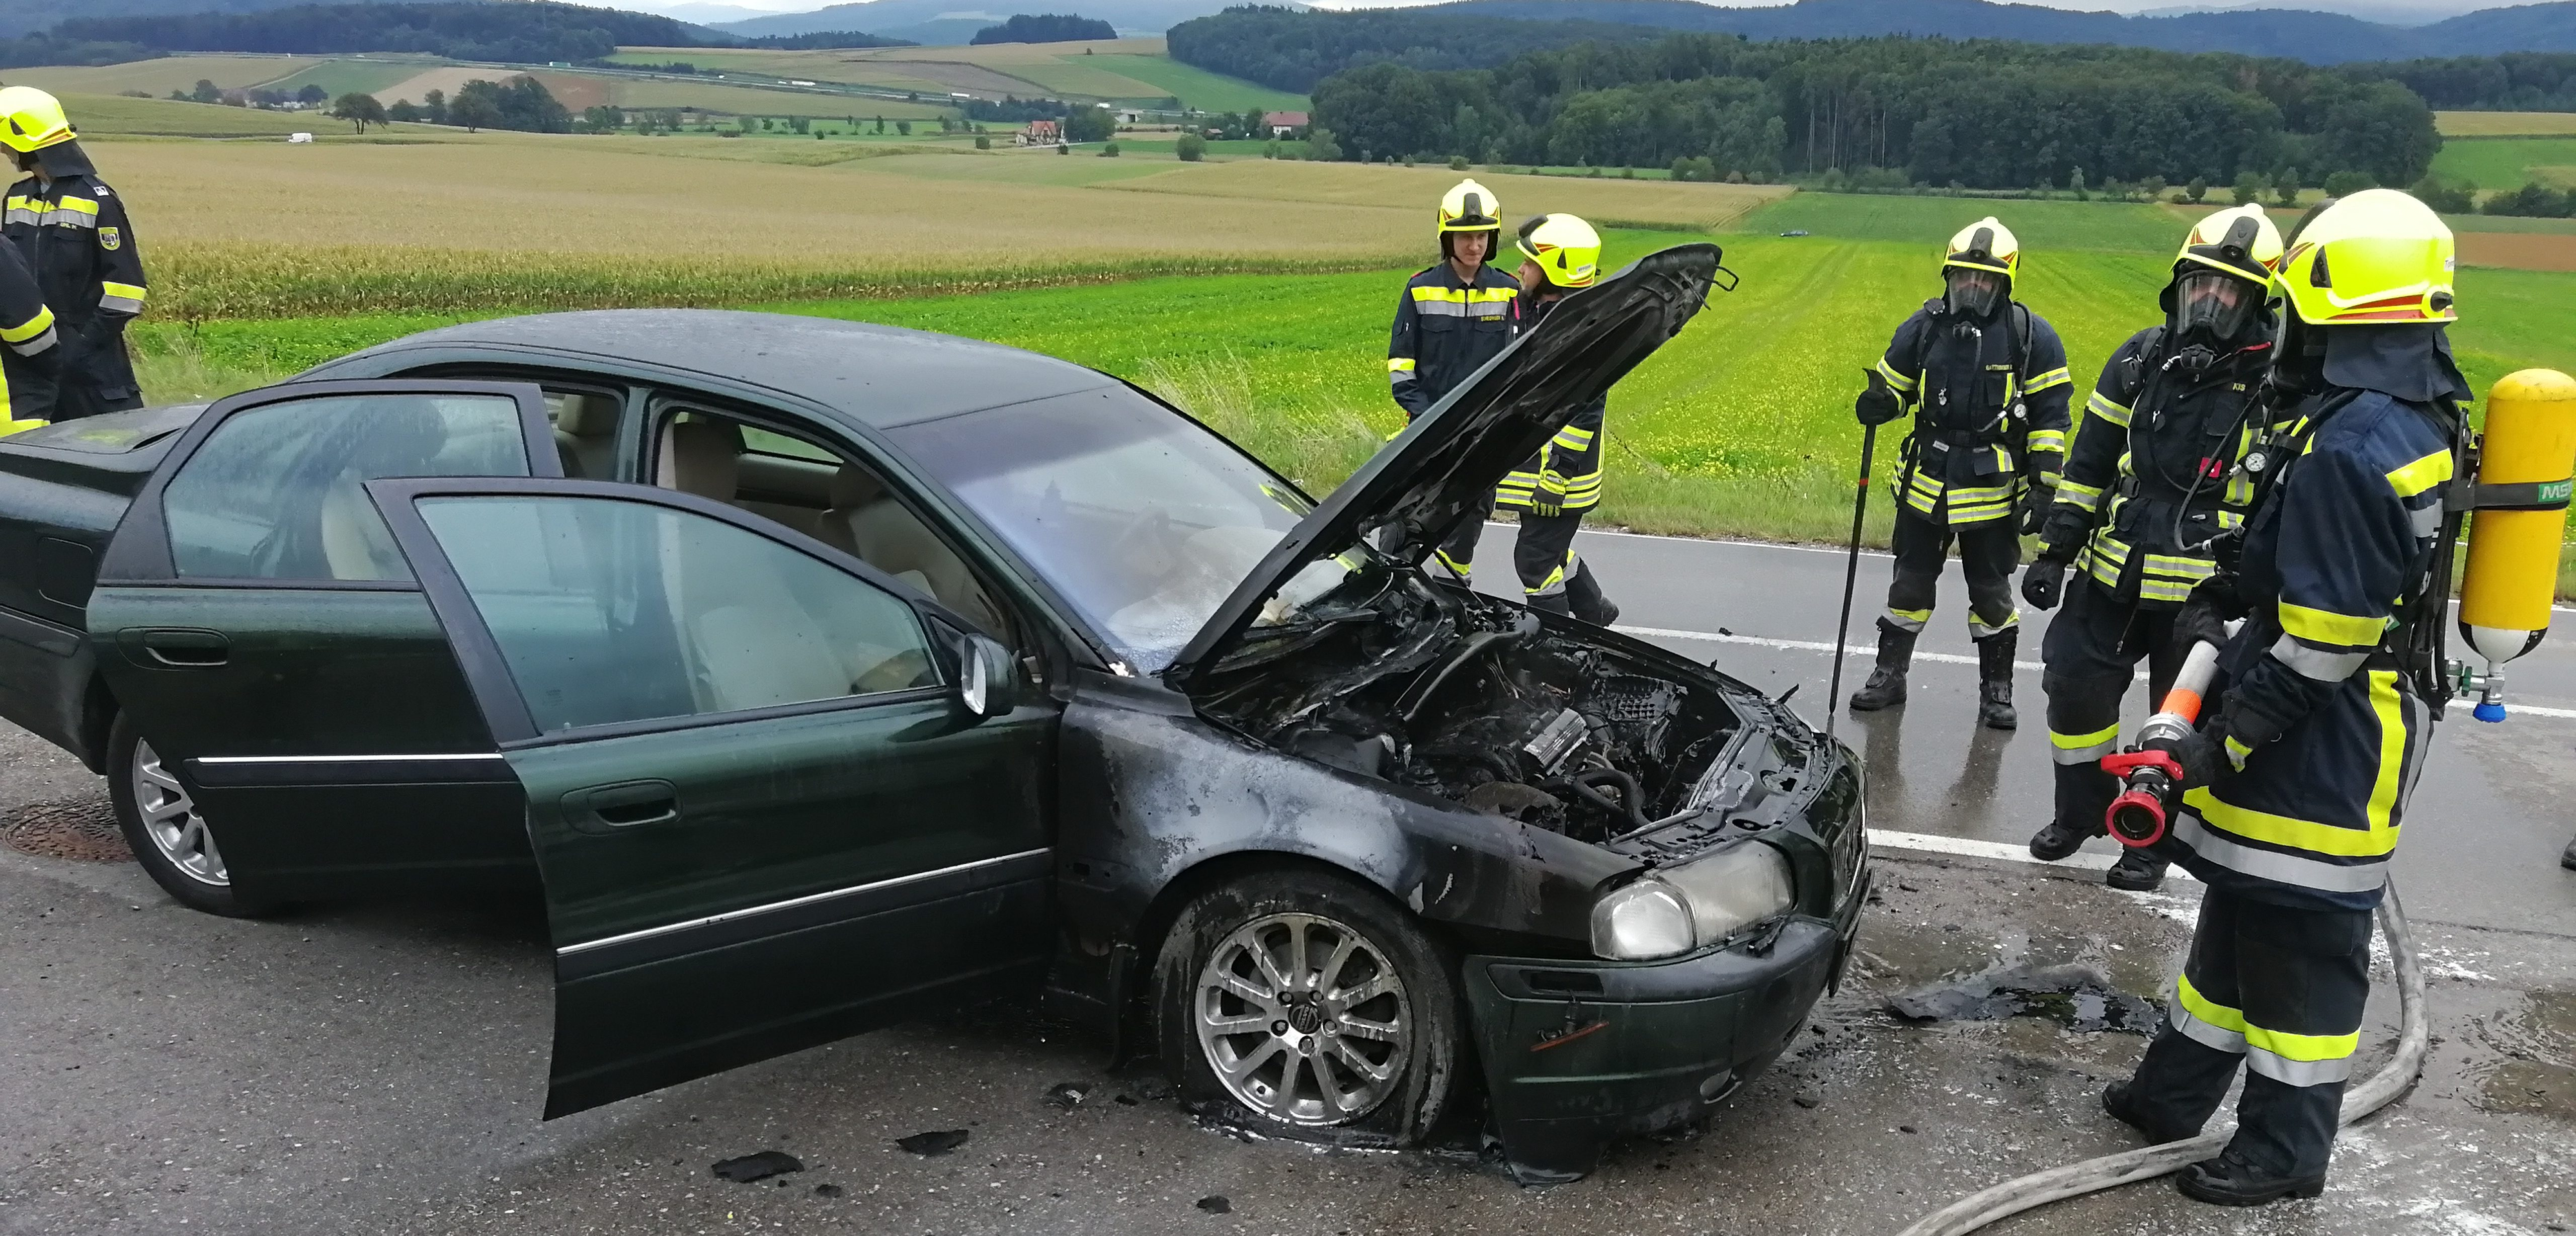 B2 - Fahrzeugbrand - 16.09.2017